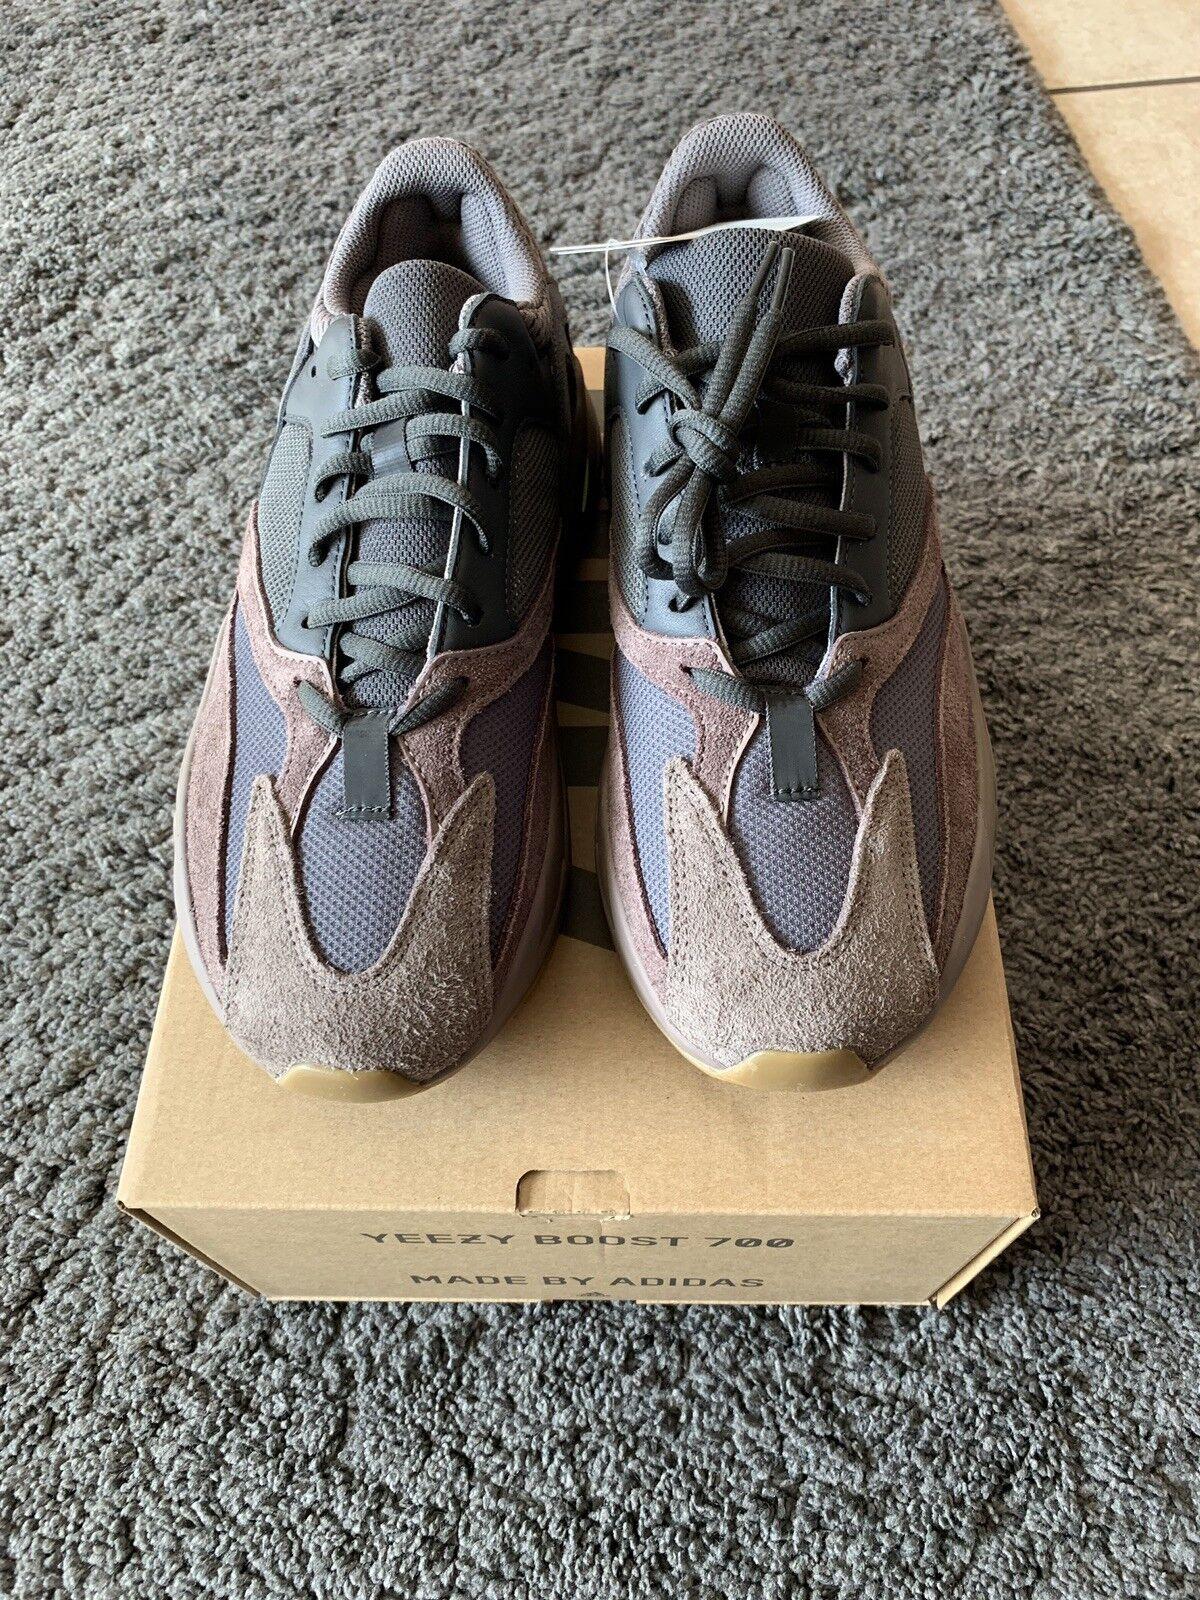 6cde0029b Adidas Kanye 700 Mauve Sz. 9.5 Boost Yeezy neegzd3844-Athletic Shoes ...